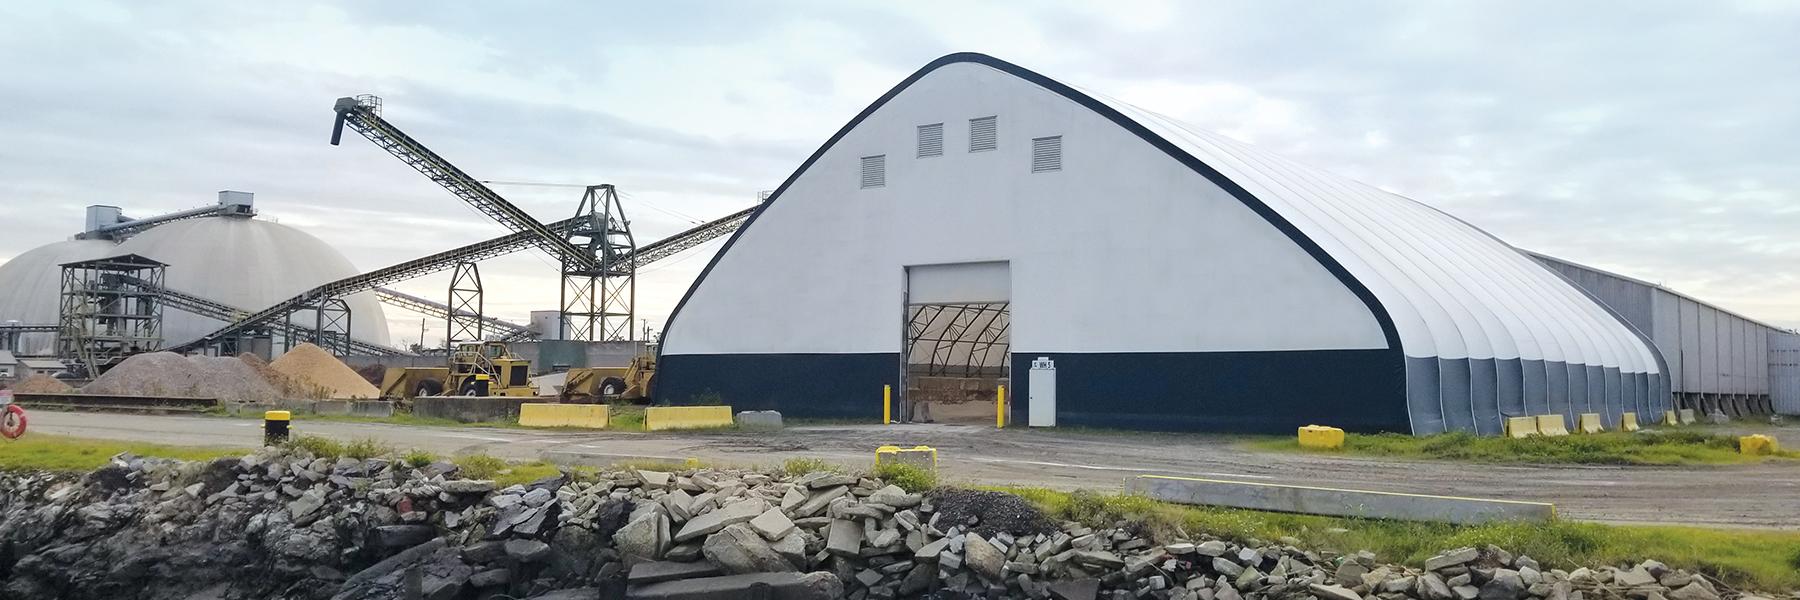 Mining Site Fabric Building